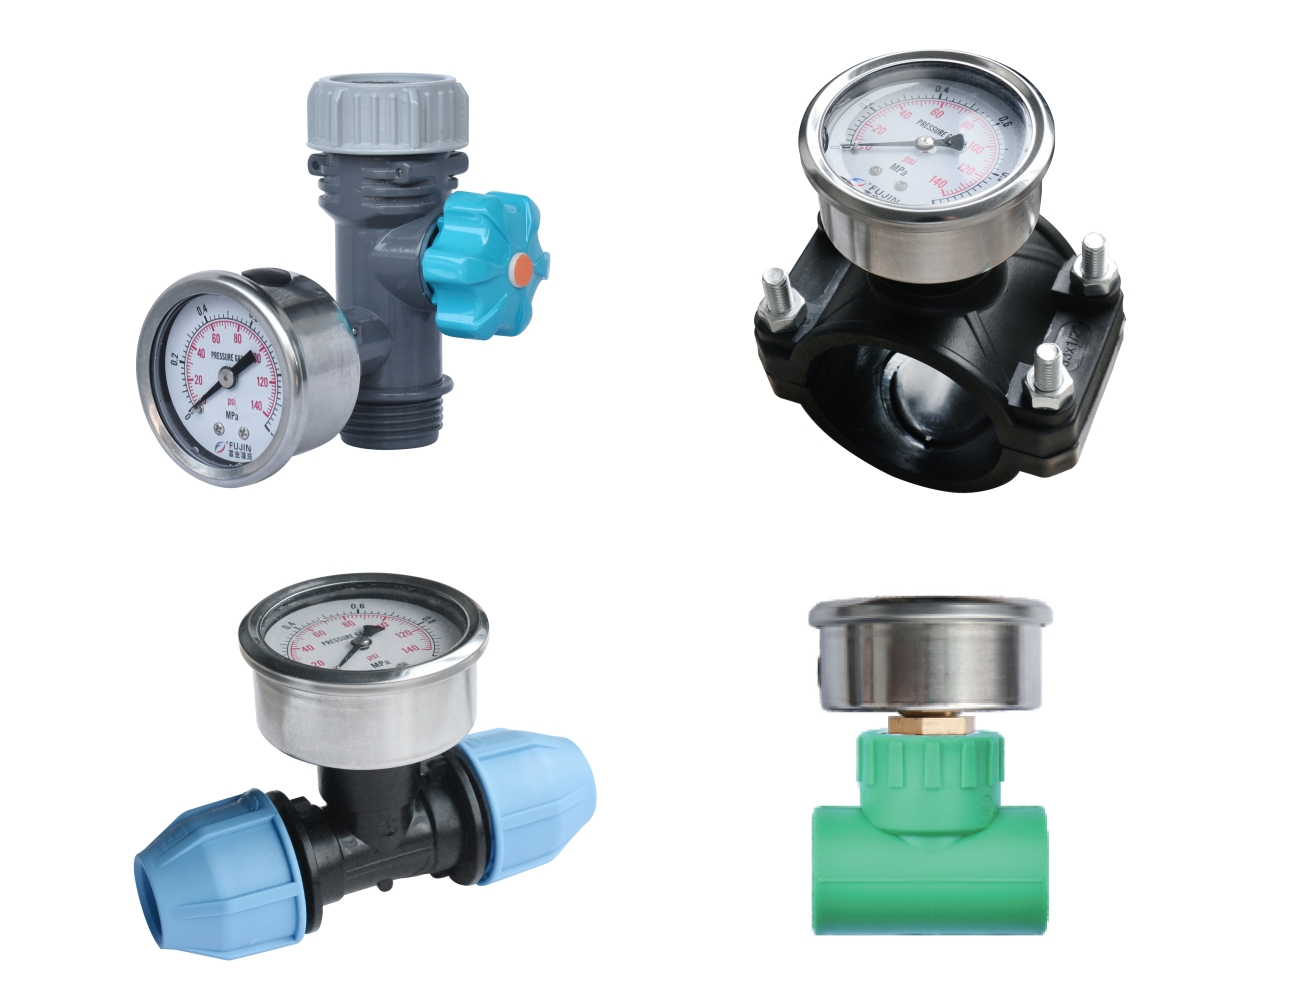 Pressure regulating ball valve